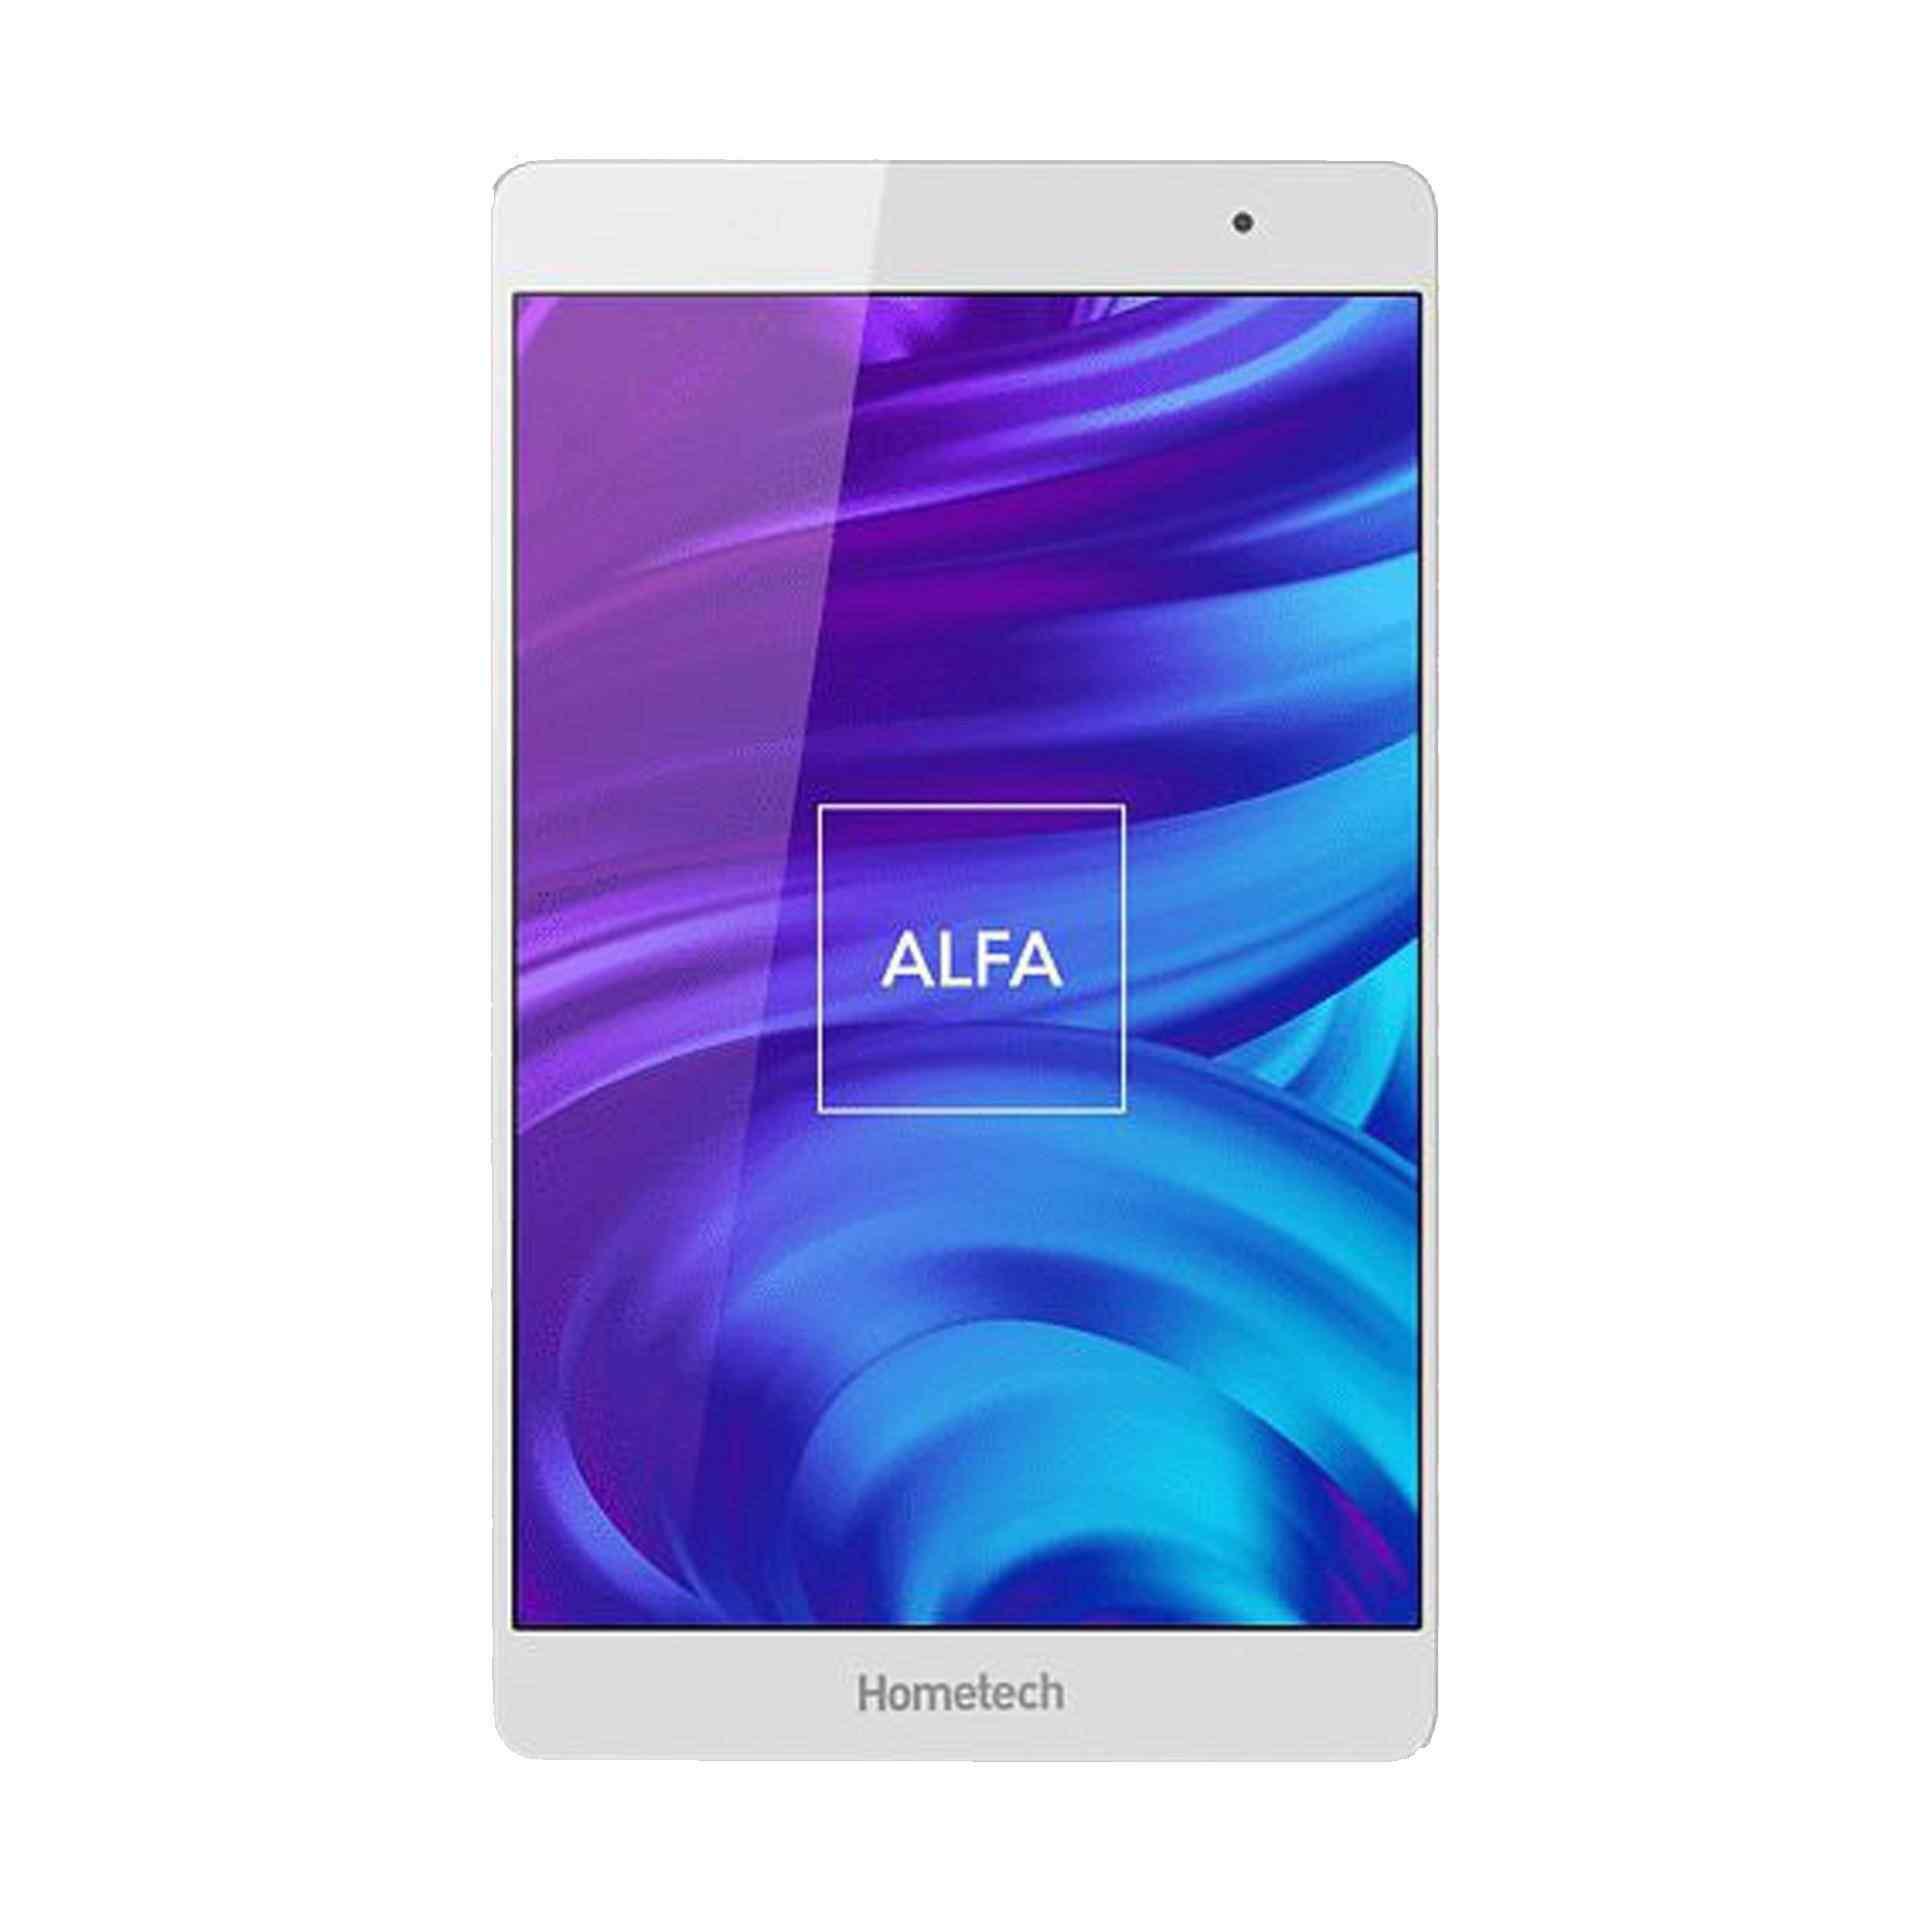 Hometech Alfa 8MY 8 IPS 2GB 32GB 3G SimKart Tablet Bilgisayar